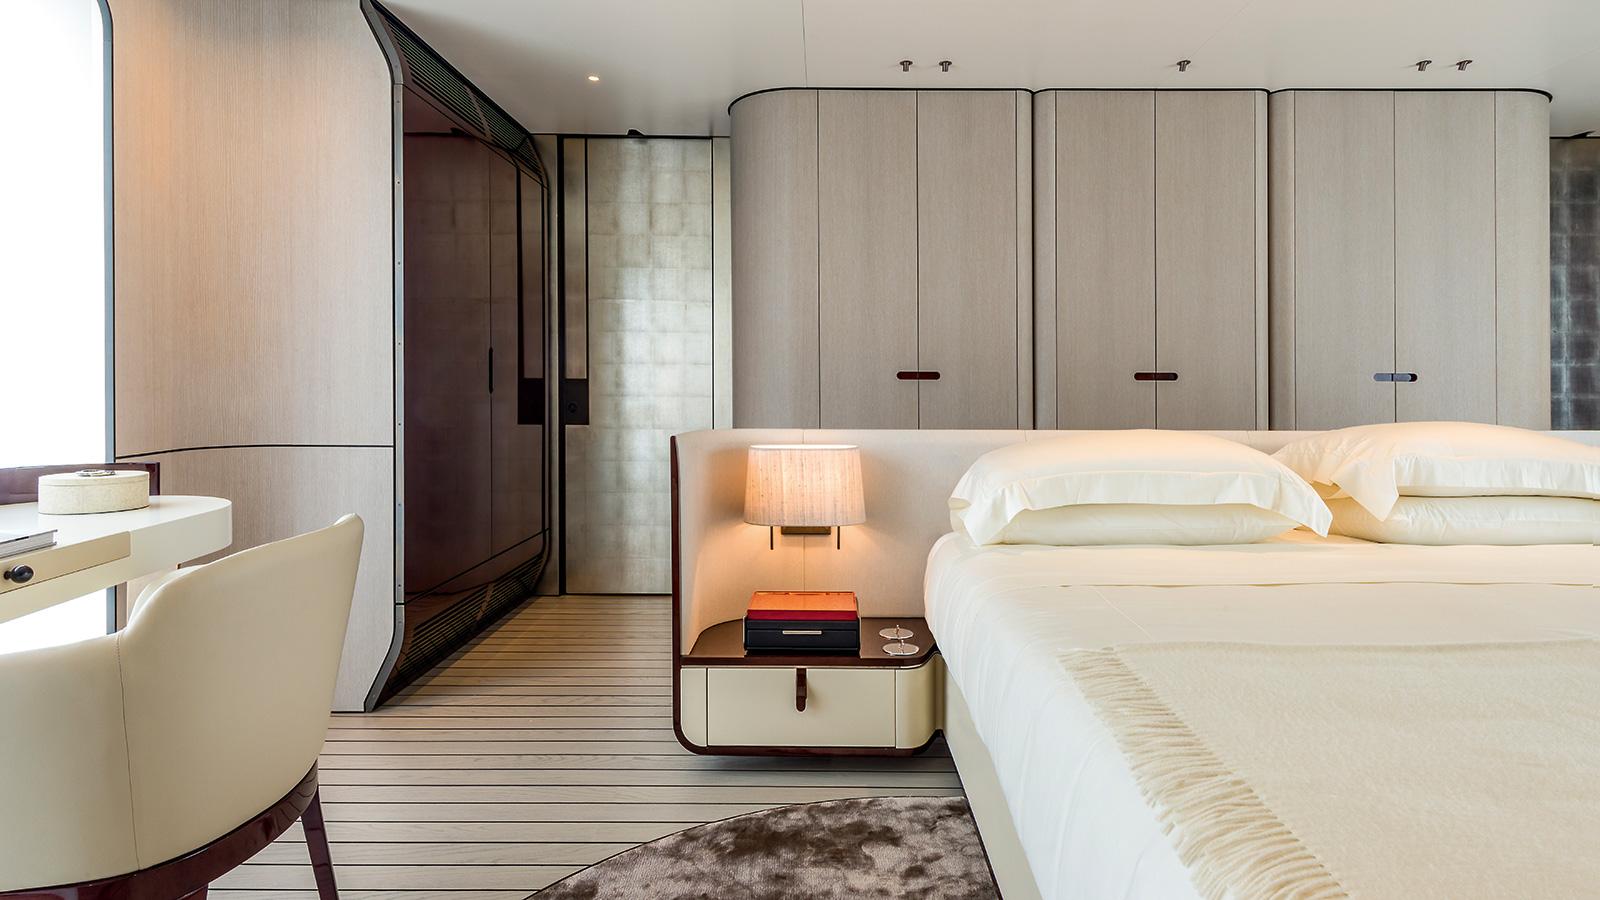 the-master-cabin-on-the-azimut-grande-35-metri-yacht